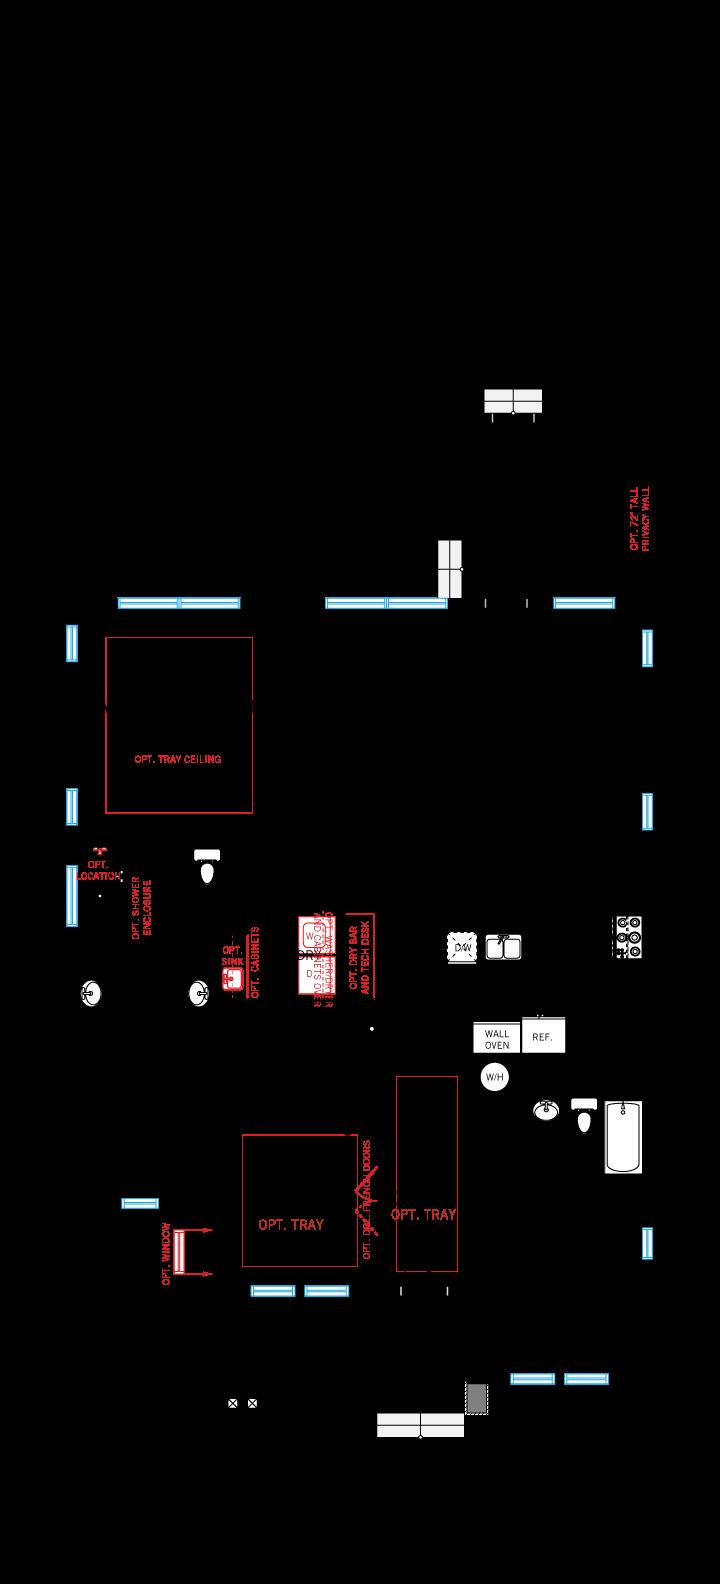 Base floorplan of Brilliance - Elev C - 2,842 sqft, 5-6 Bedroom, 3 Bathroom - Cardel Homes Tampa